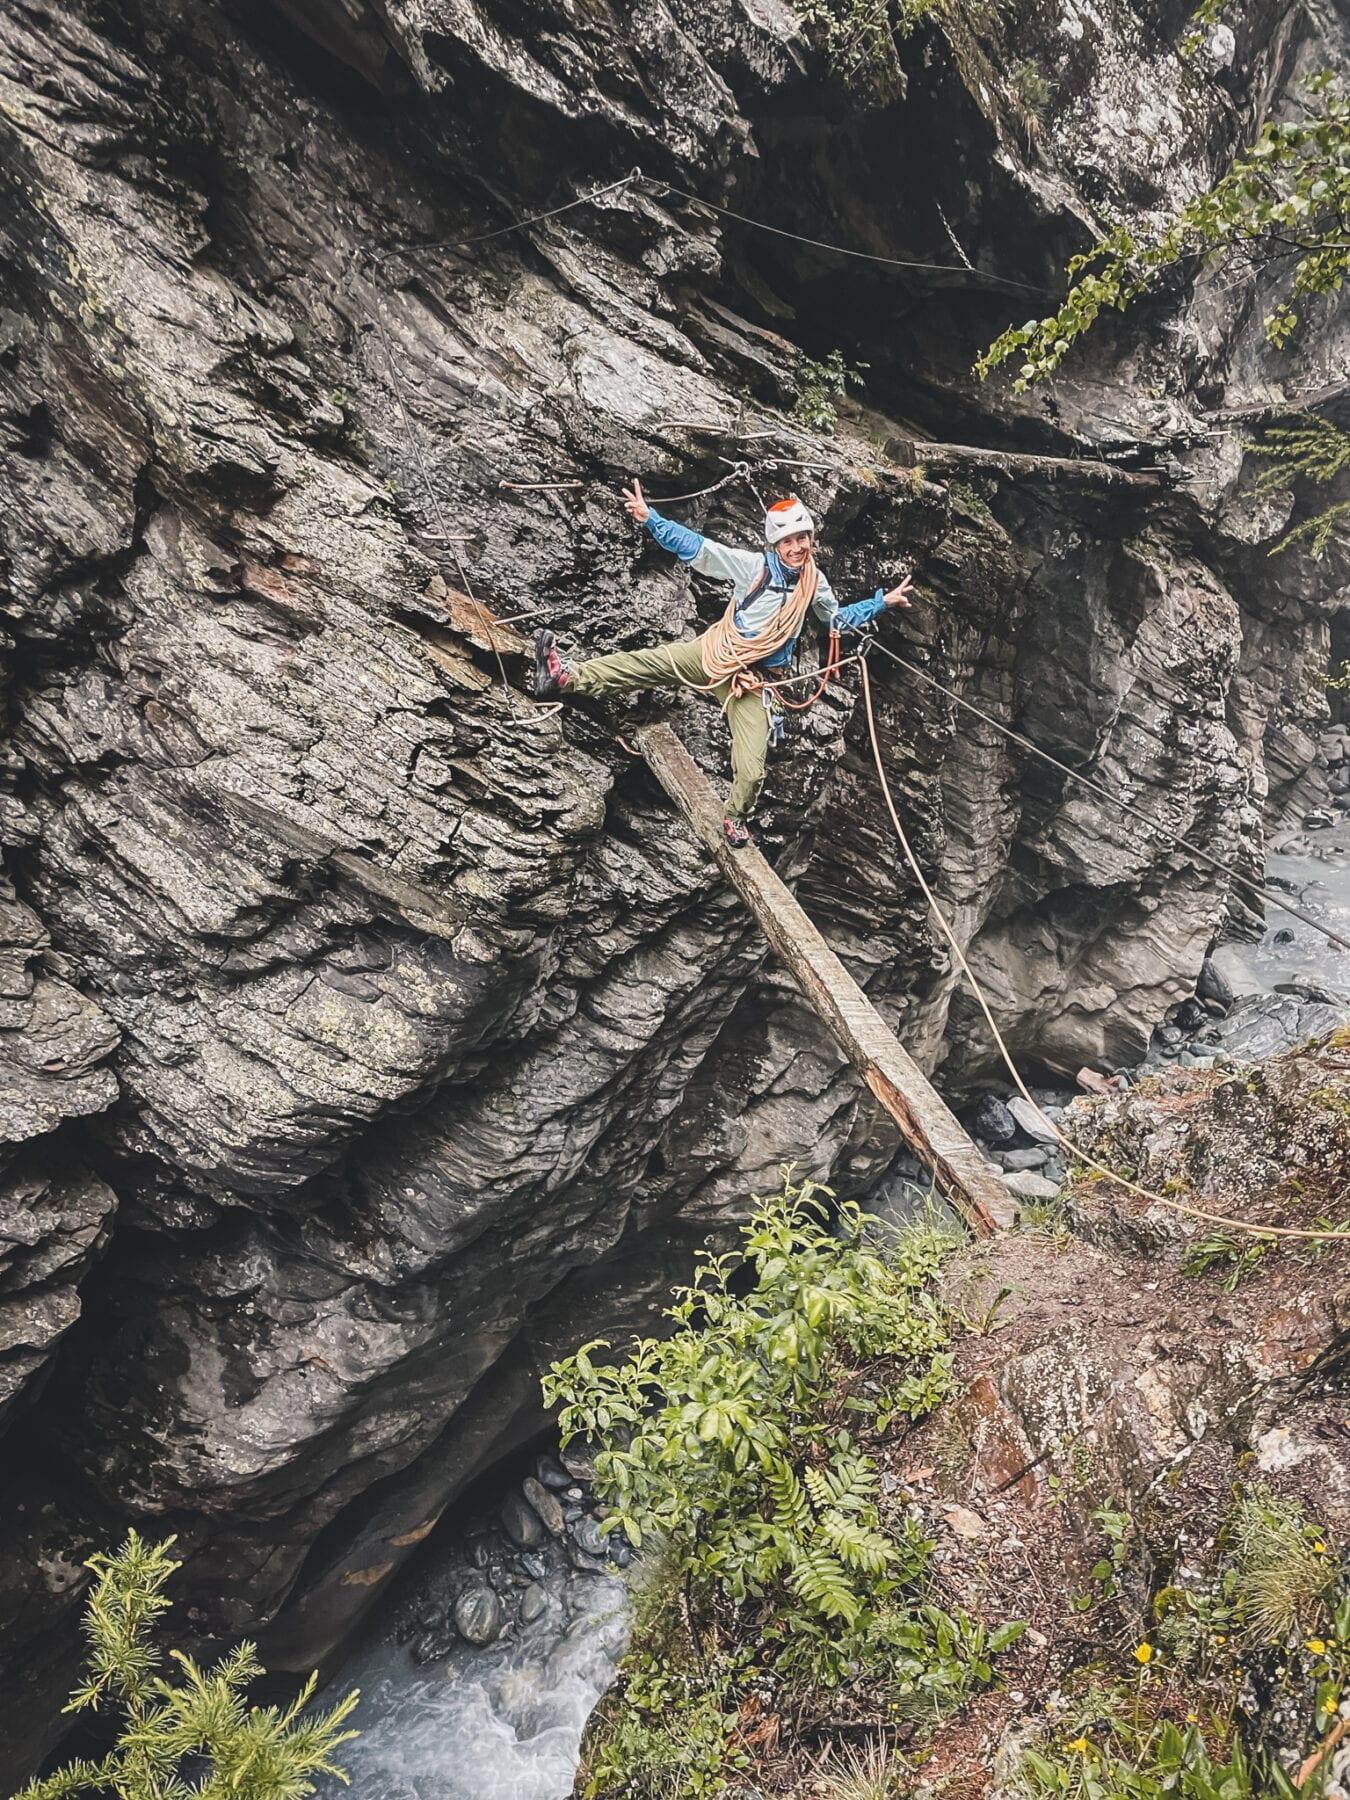 Gorge Alpine Saas Fee Via Ferrata